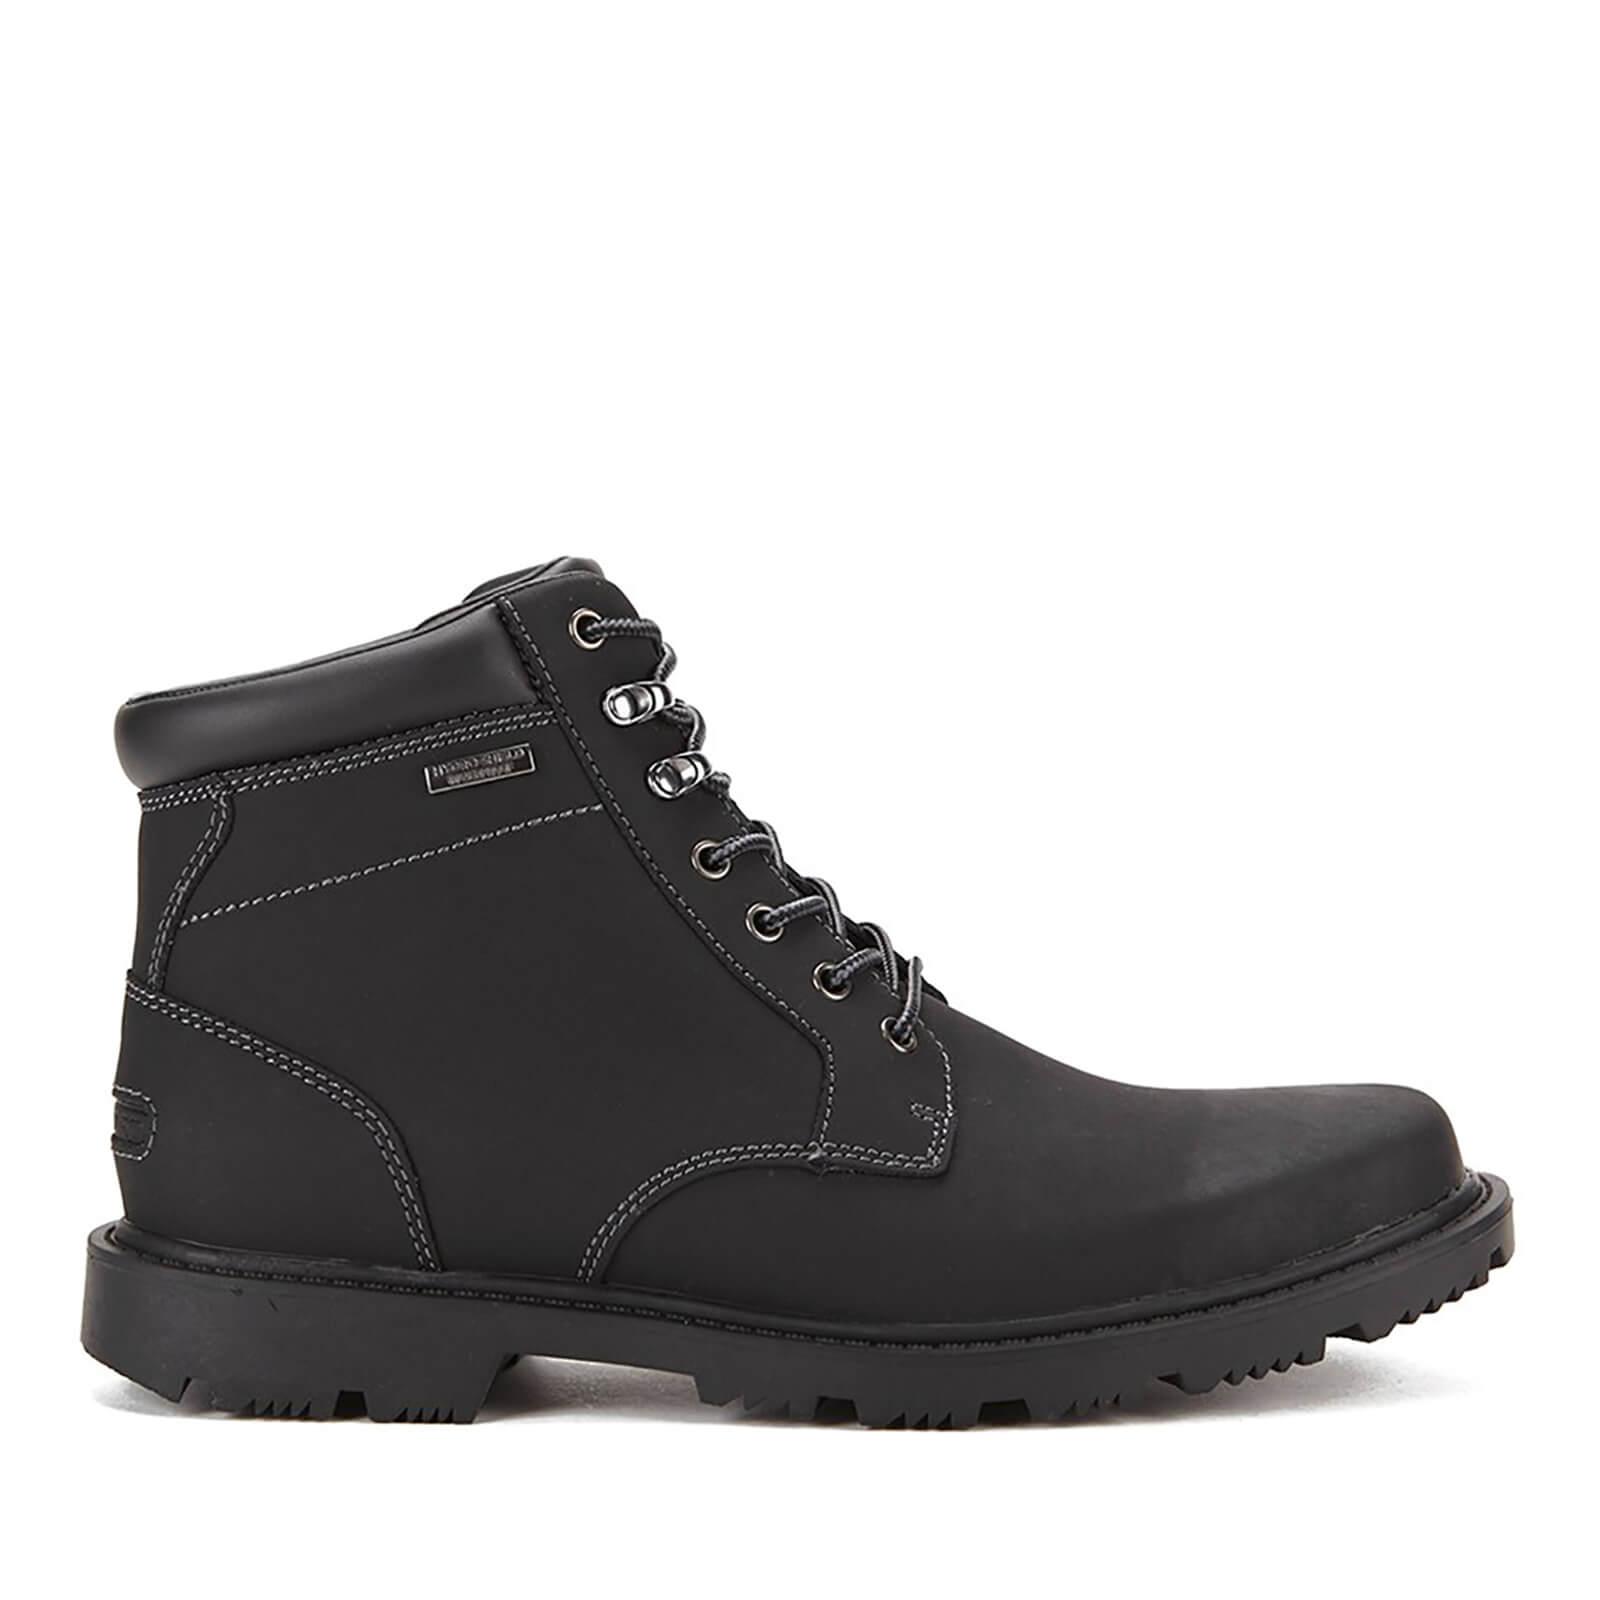 Rockport Mens Redemption Road Boots Black Footwear Zavvi Bott Funko Mm Rick Morty